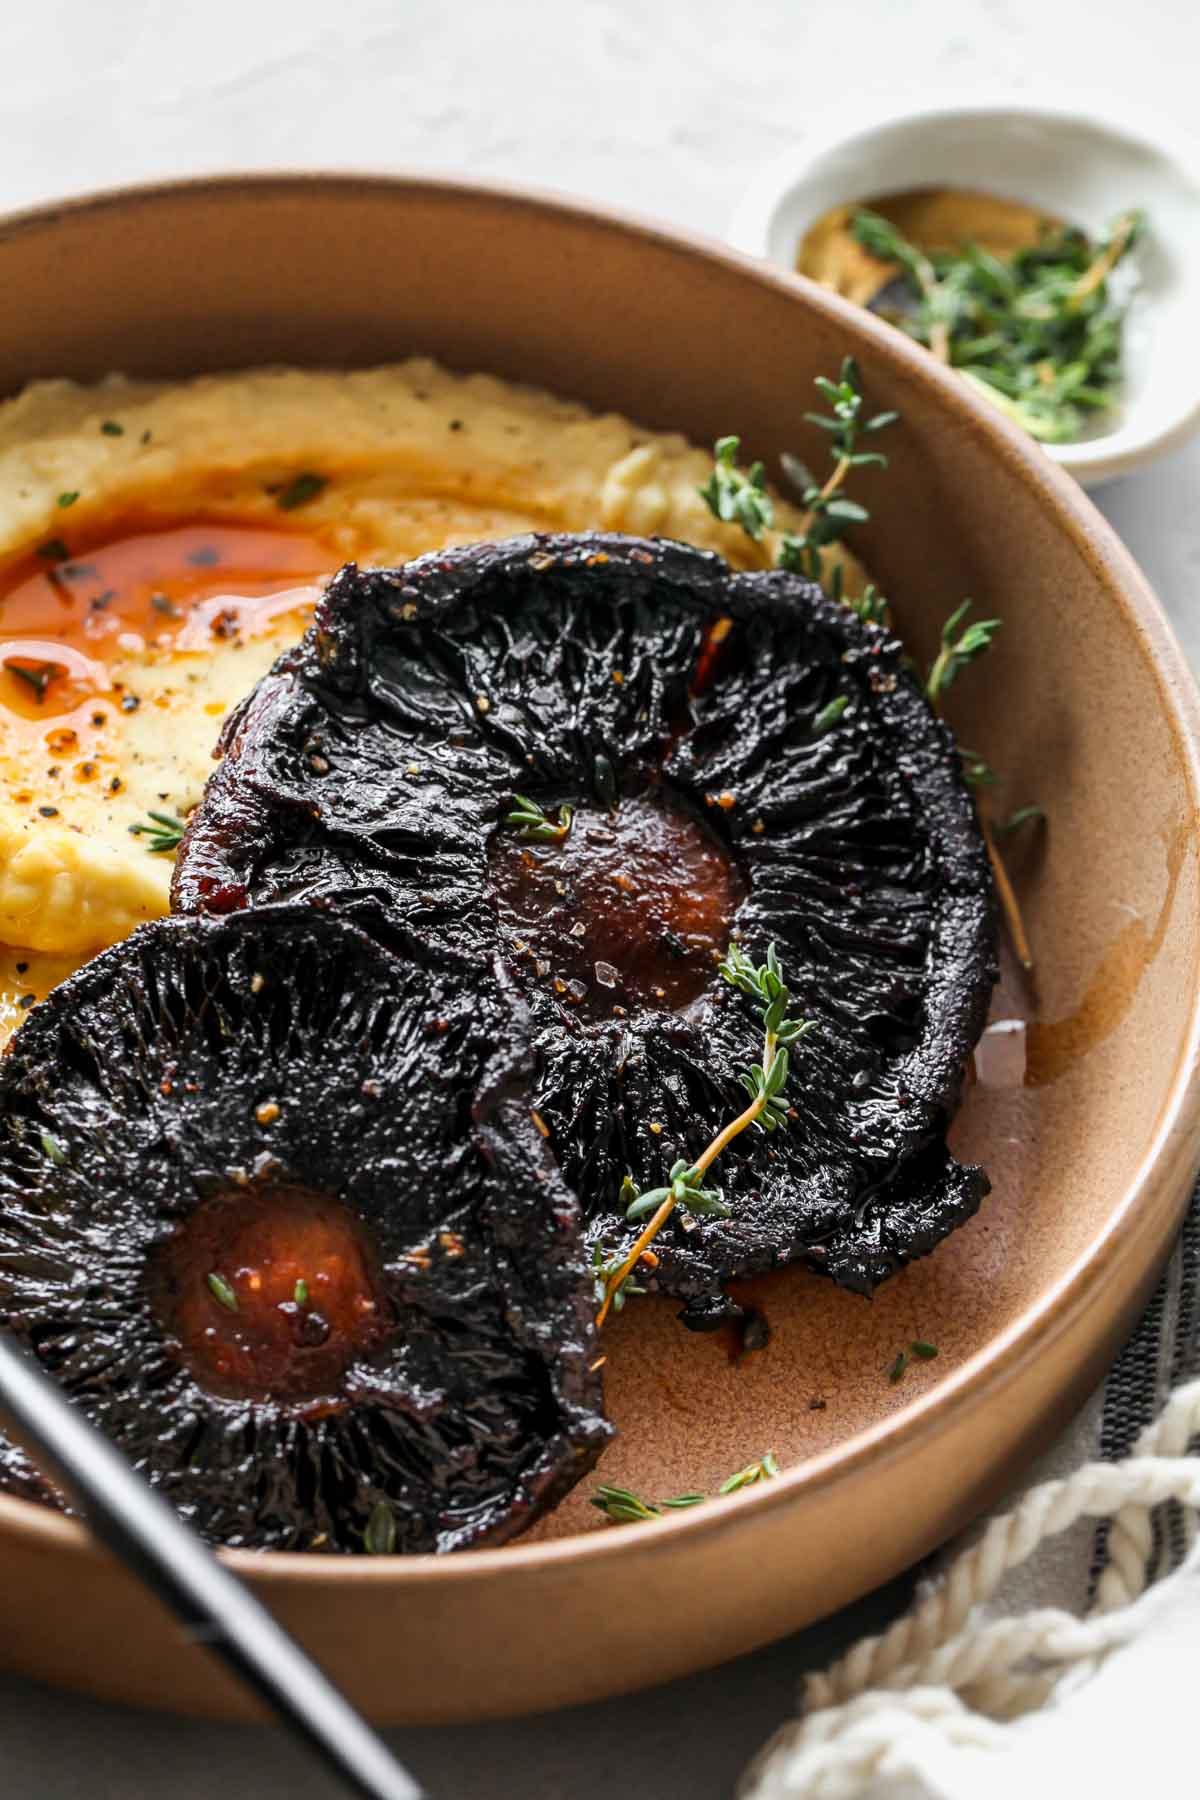 Roasted portobello mushrooms on a plate garnished with fresh tyme